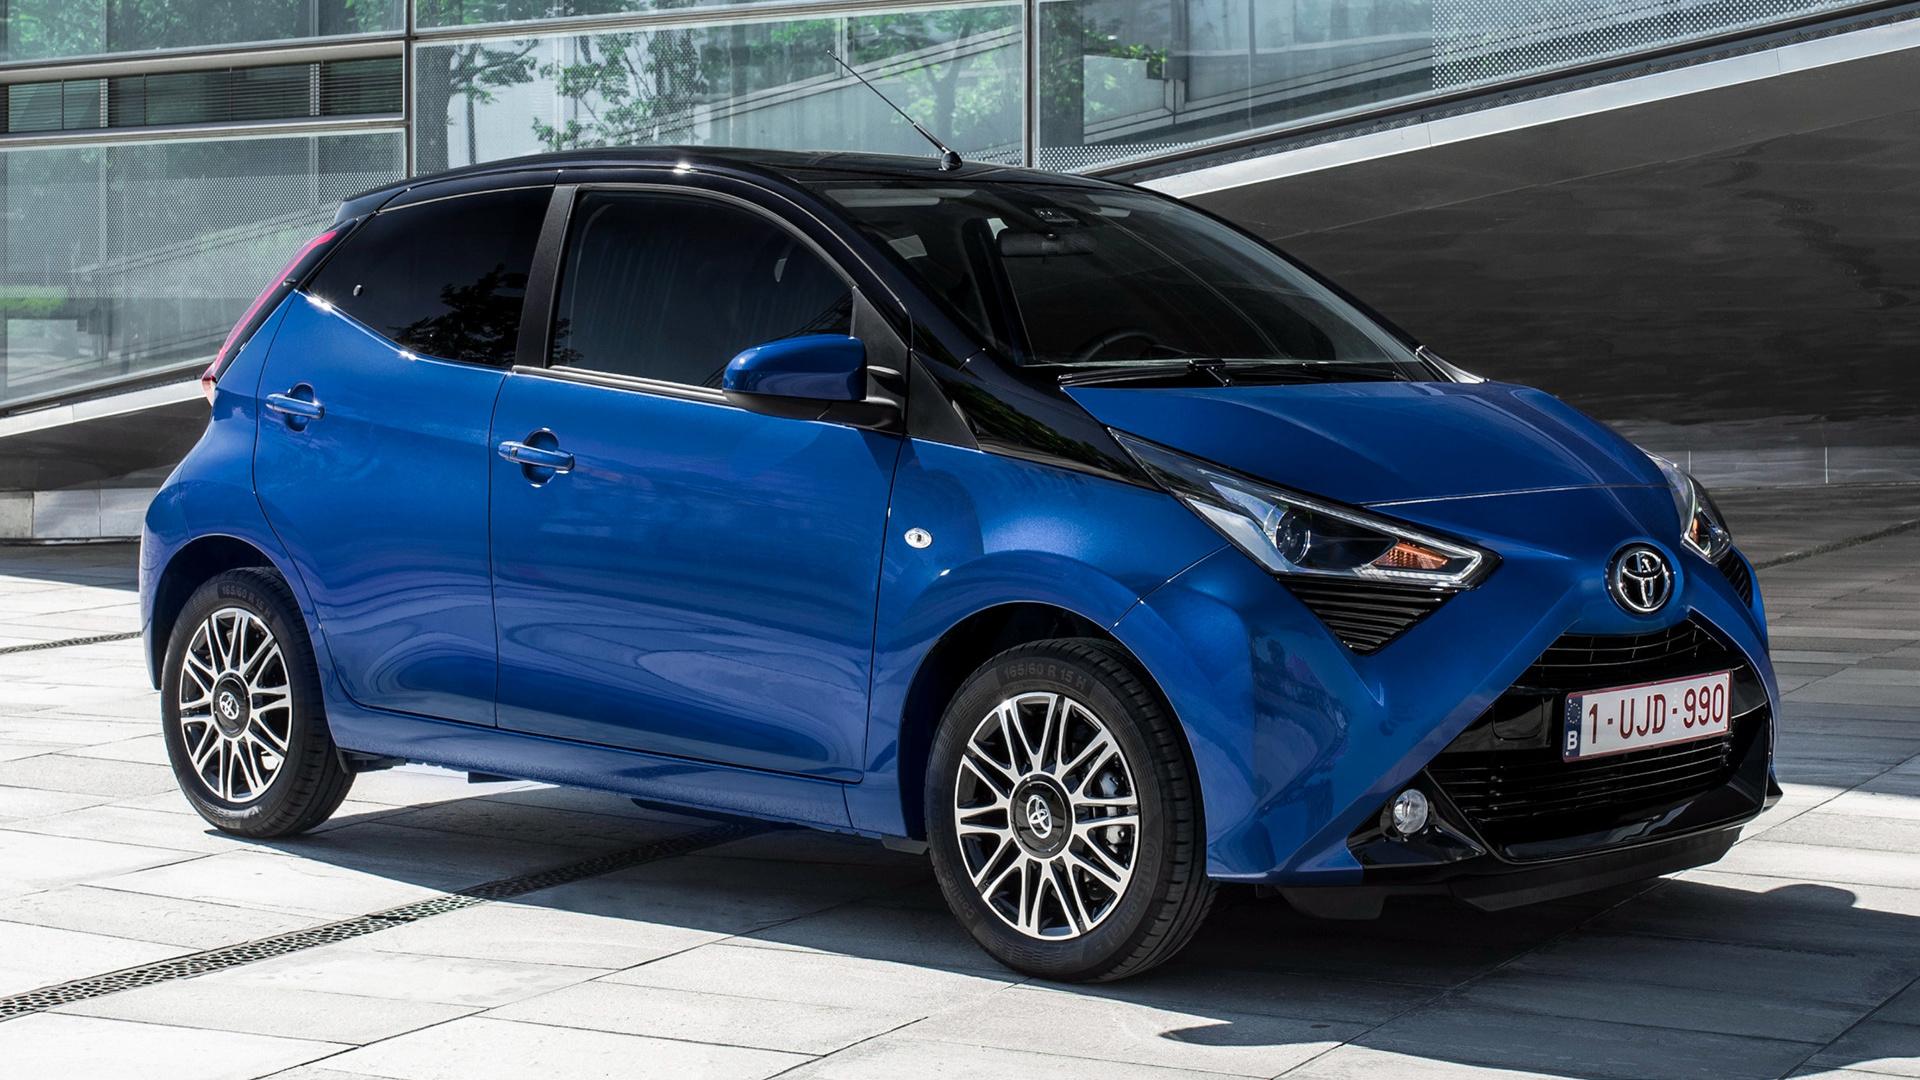 2018 Toyota Aygo 5 door   Wallpapers and HD Images Car Pixel 1920x1080